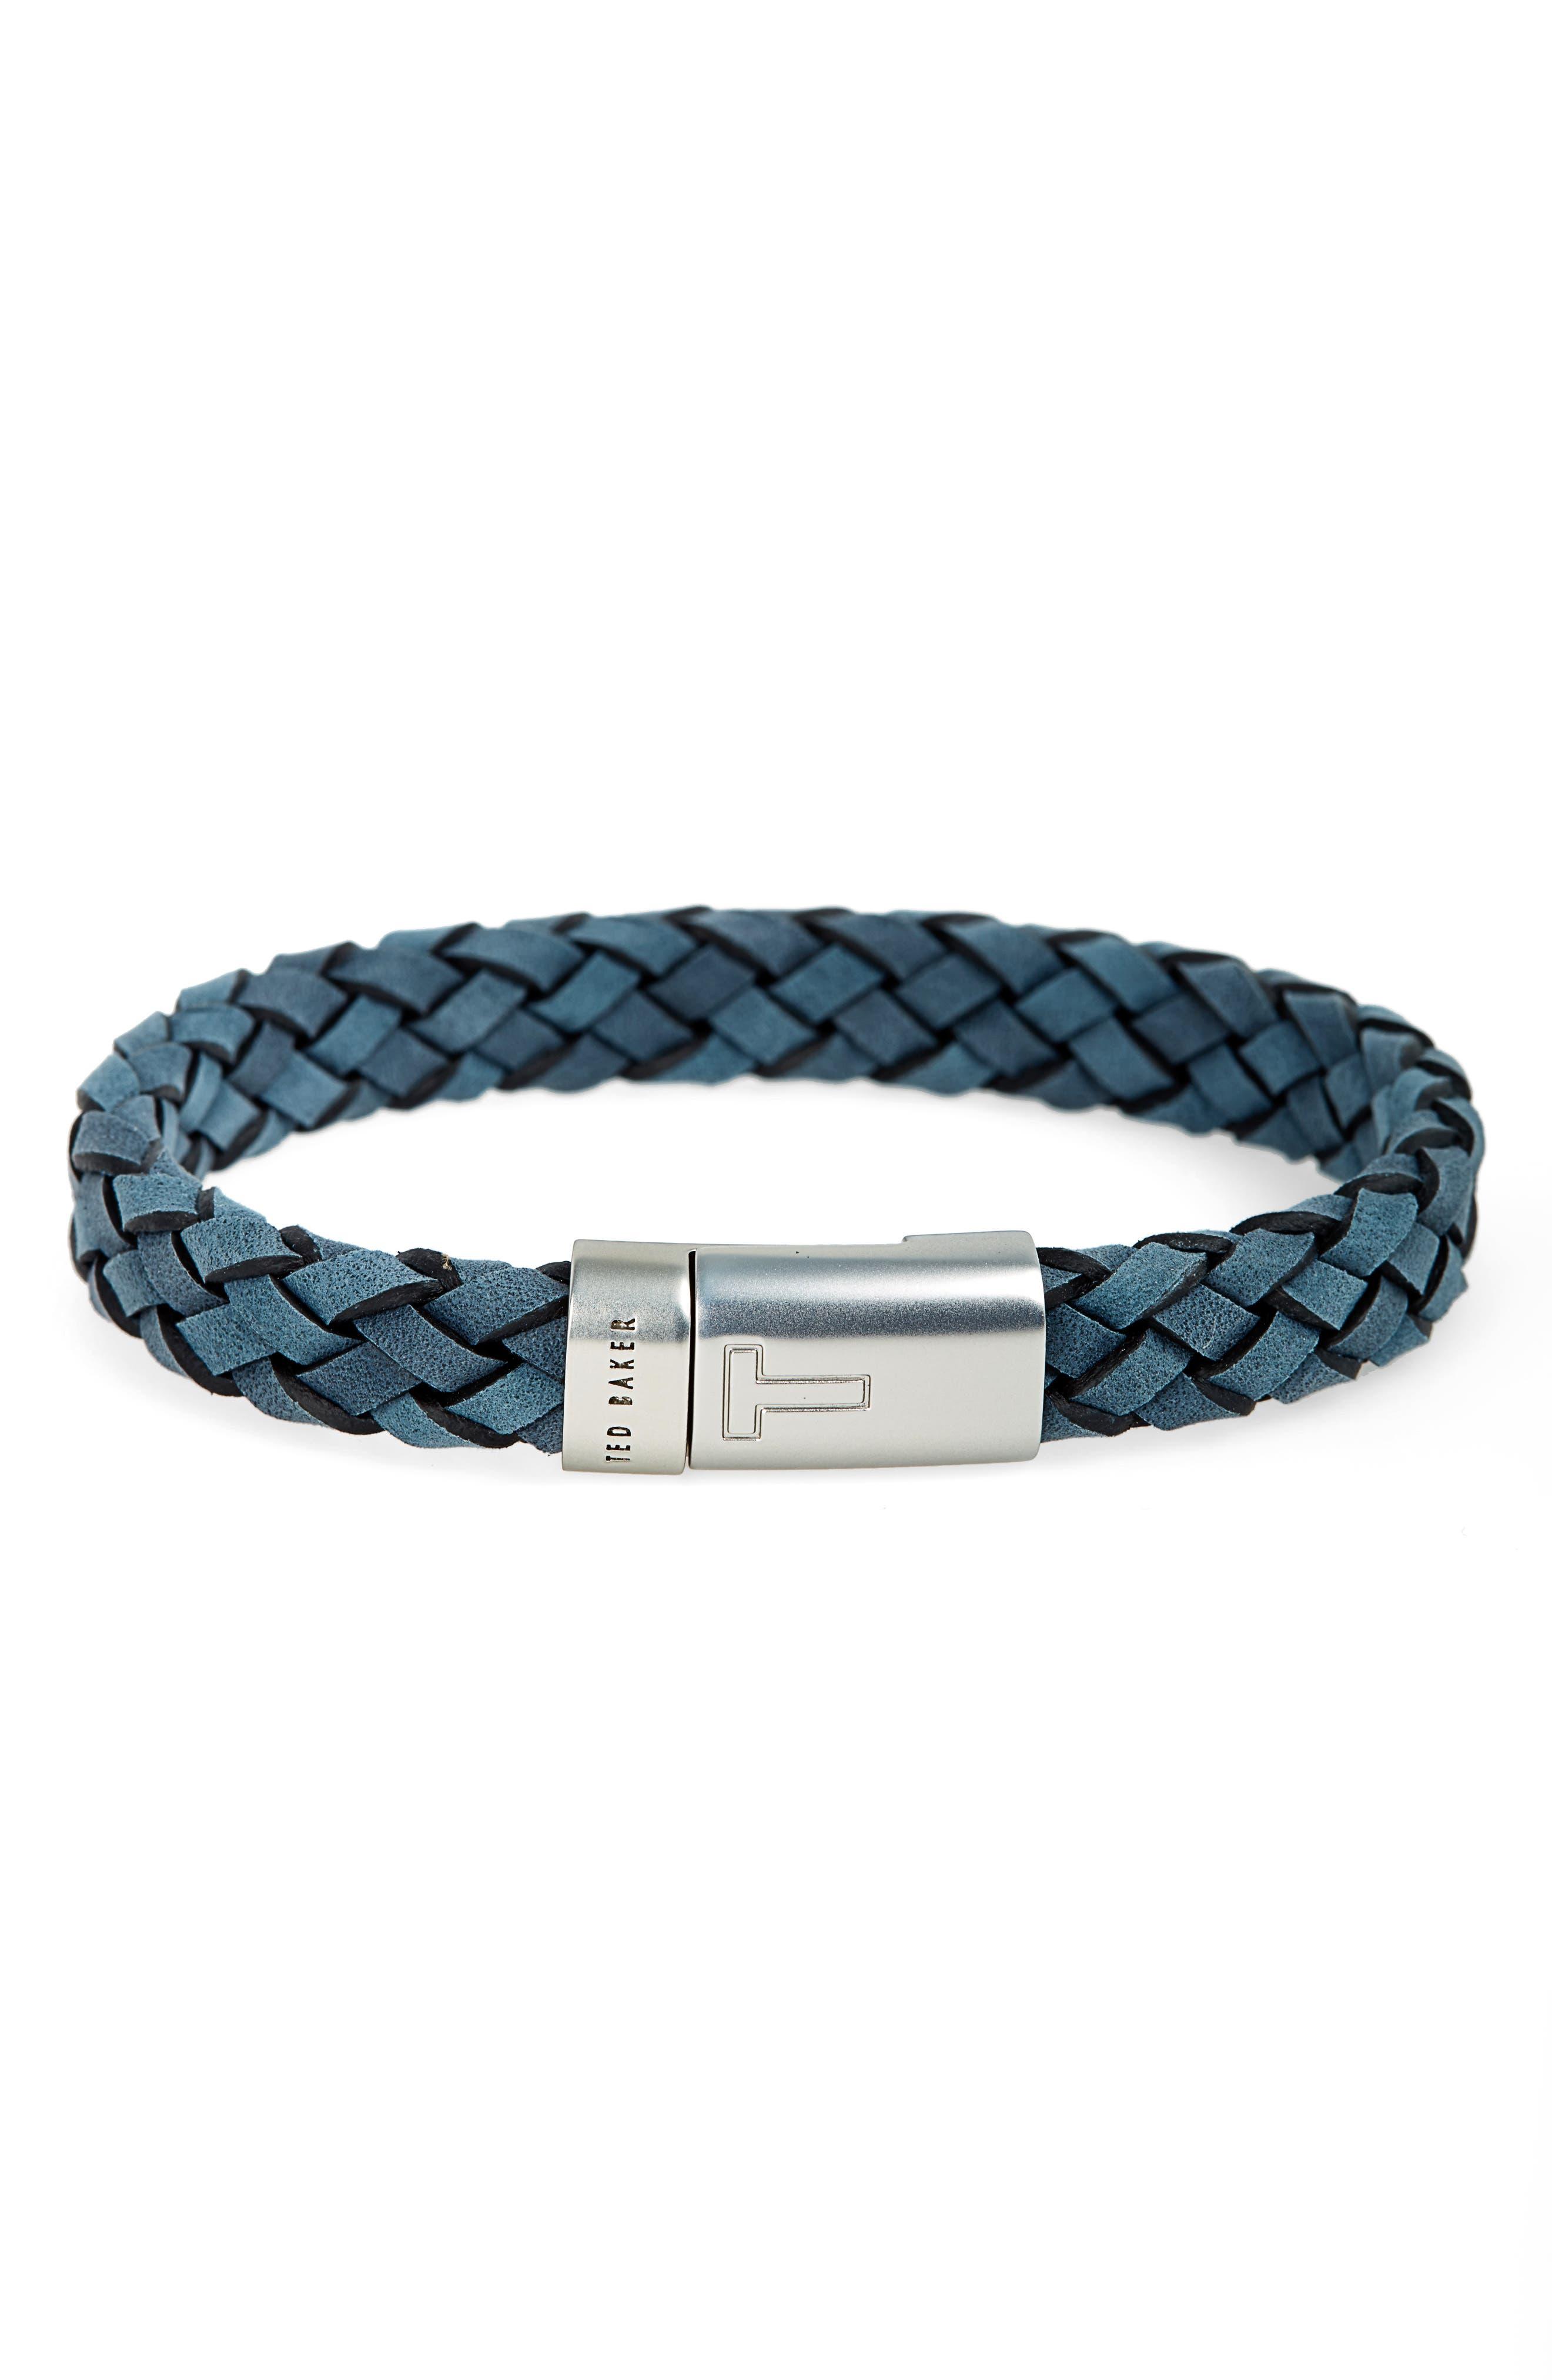 Runfast Woven Leather Bracelet,                             Main thumbnail 1, color,                             Navy